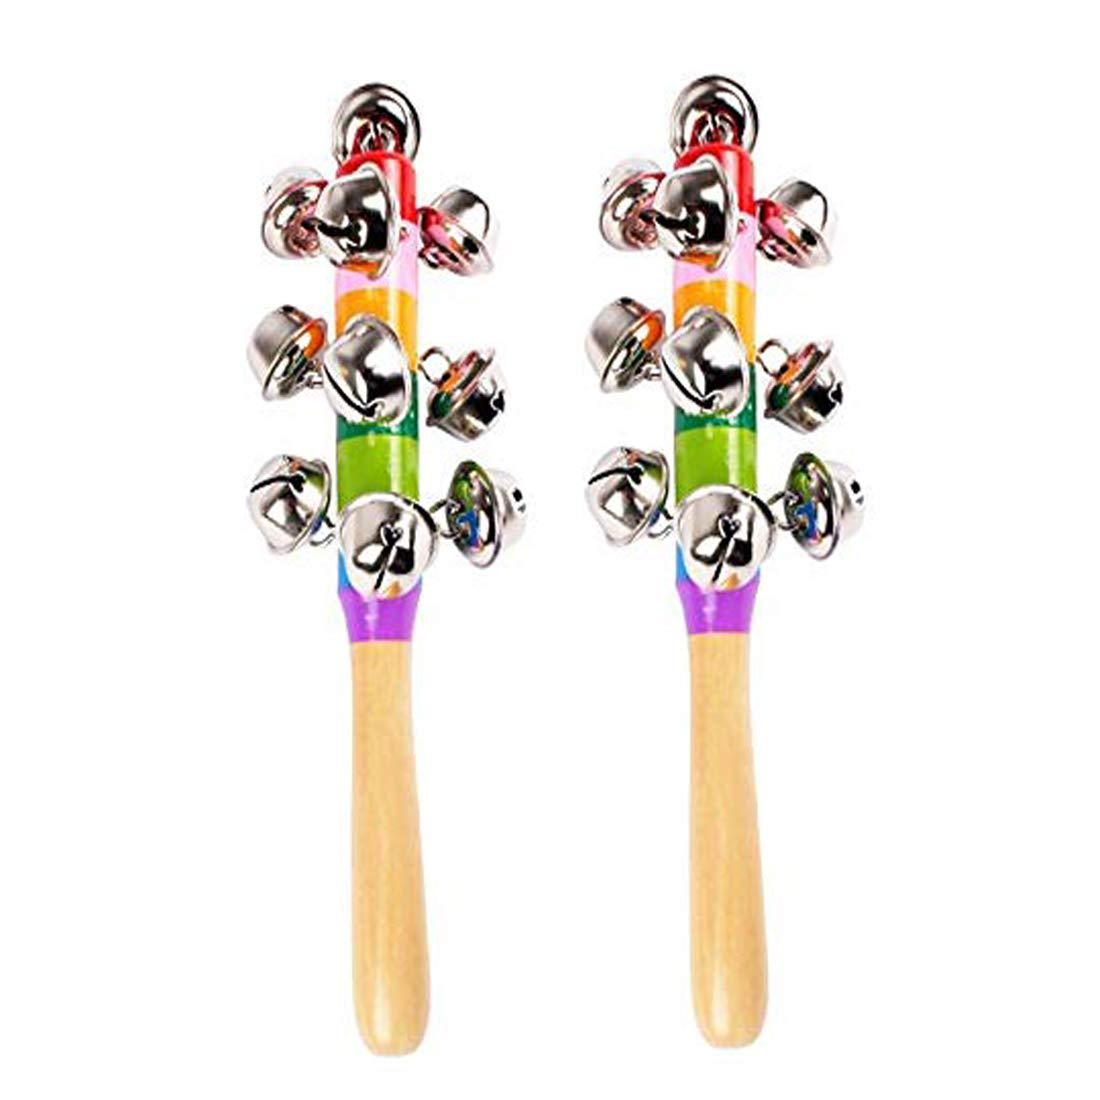 ELEOPTION Musical Instruments for Toddlers,kids Musical Instruments Wooden Bells Jingle Stick Shaker Rattle Vivid Color Rainbow Handle Musical Toys Set for Children Boys Girls With Storage Bag 4pcs